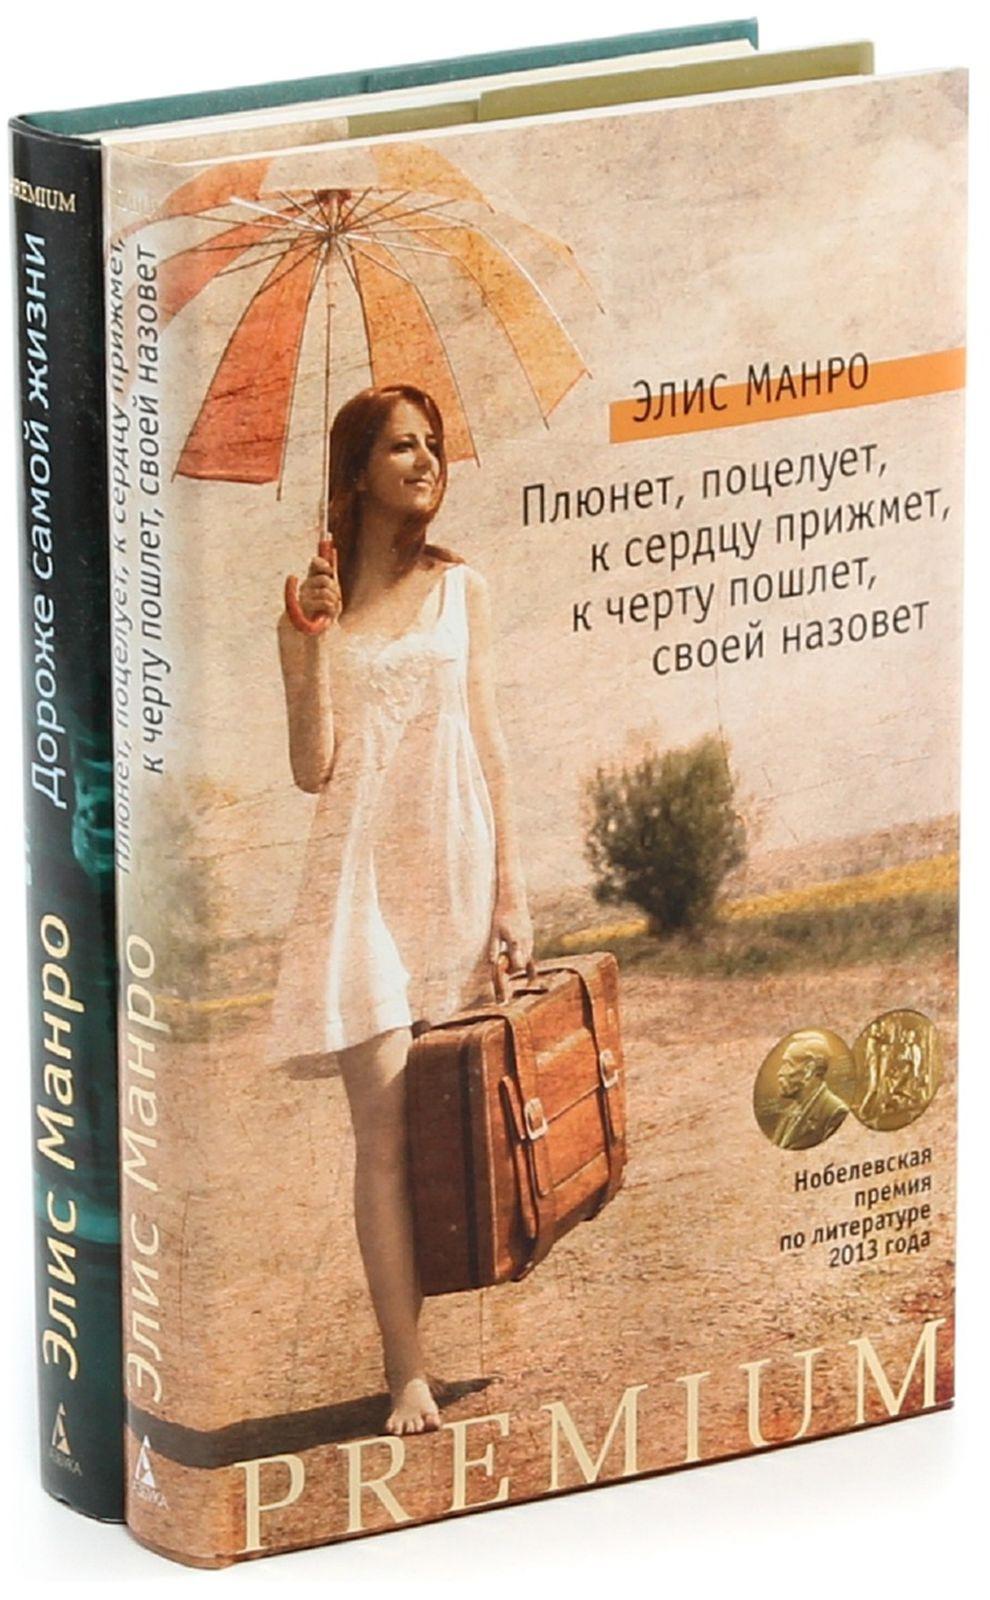 "Элис Манро Элис Манро. Серия ""Азбука Premium"" (комплект из 2 книг)"